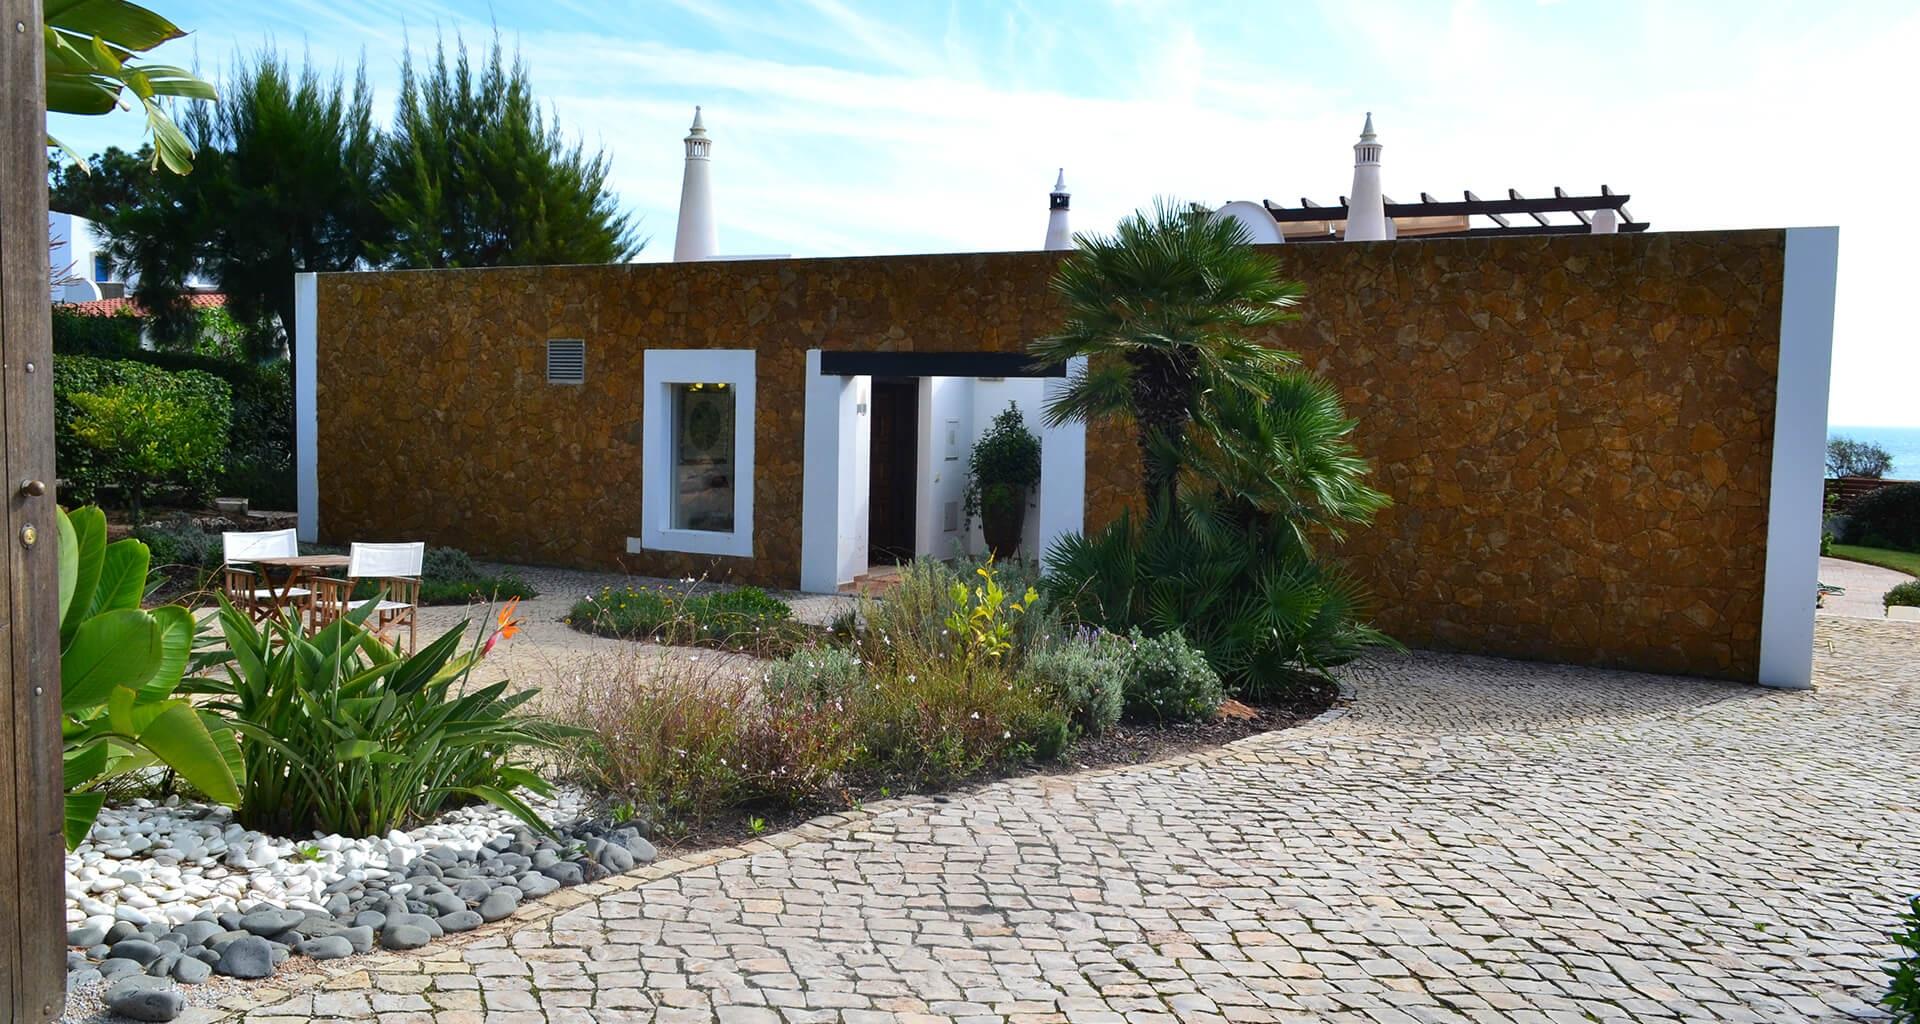 Vale do Lobo and Surroundings Villa Gallery